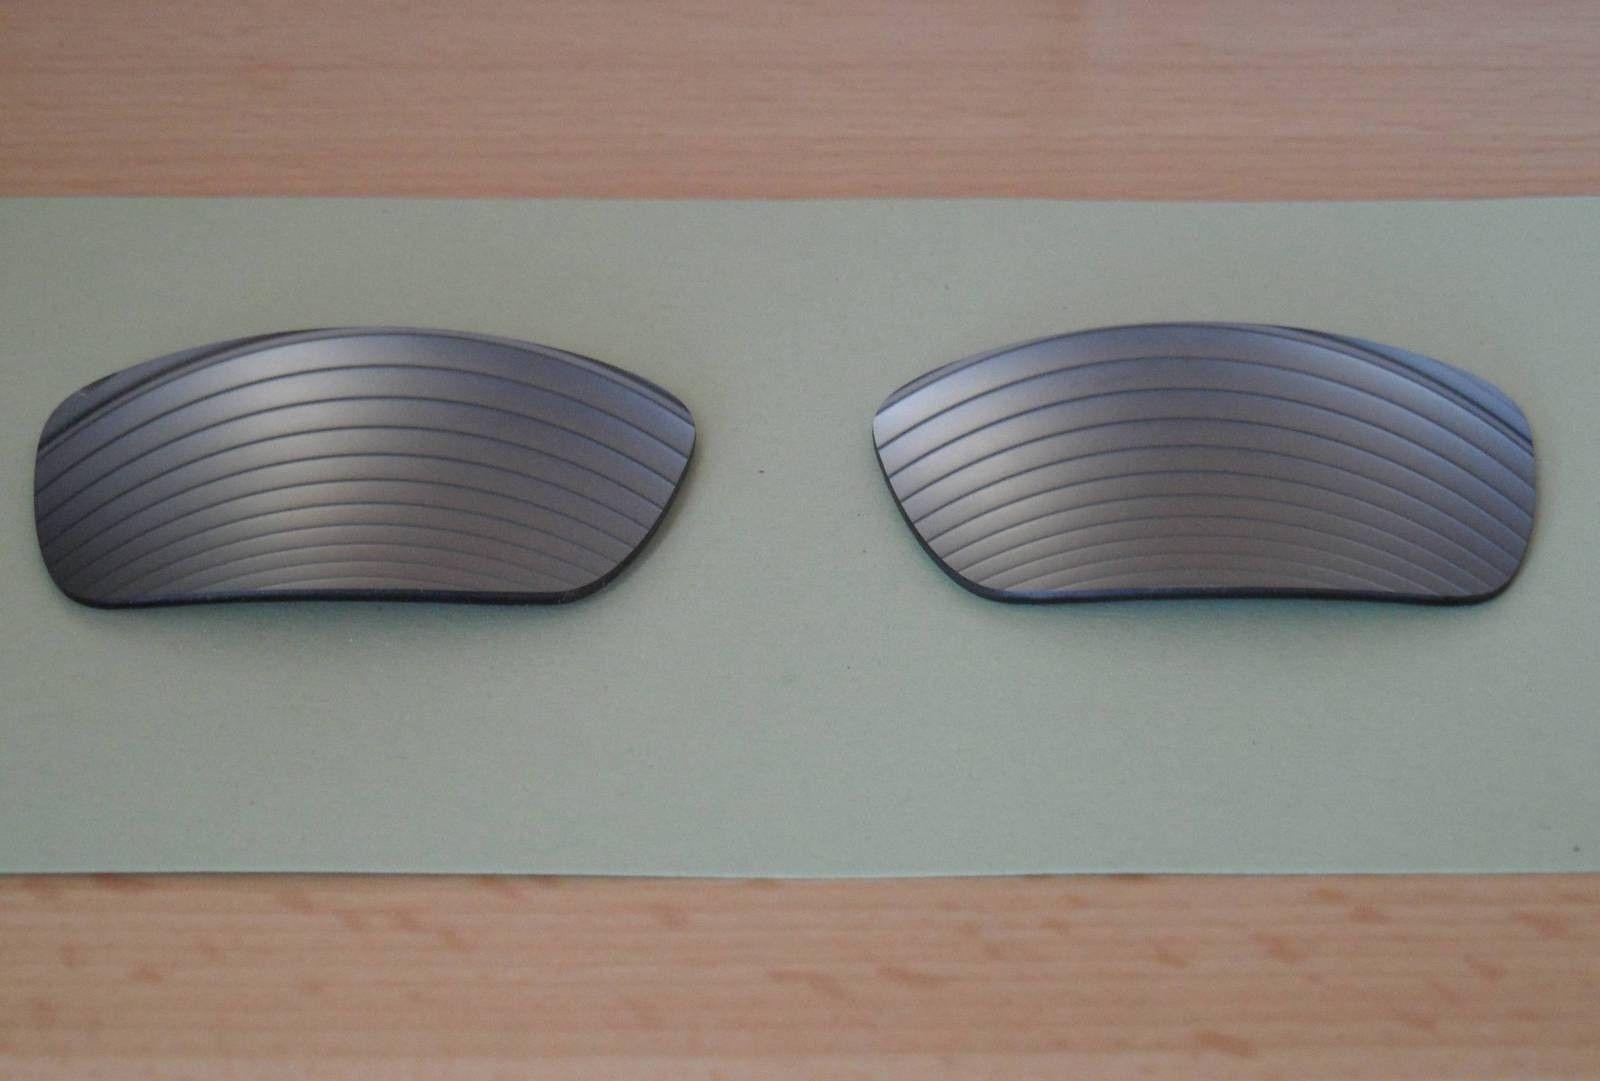 Fuel Cell Chrome Iridium Lenses - OEM & NEW - yux9ng2l.jpg